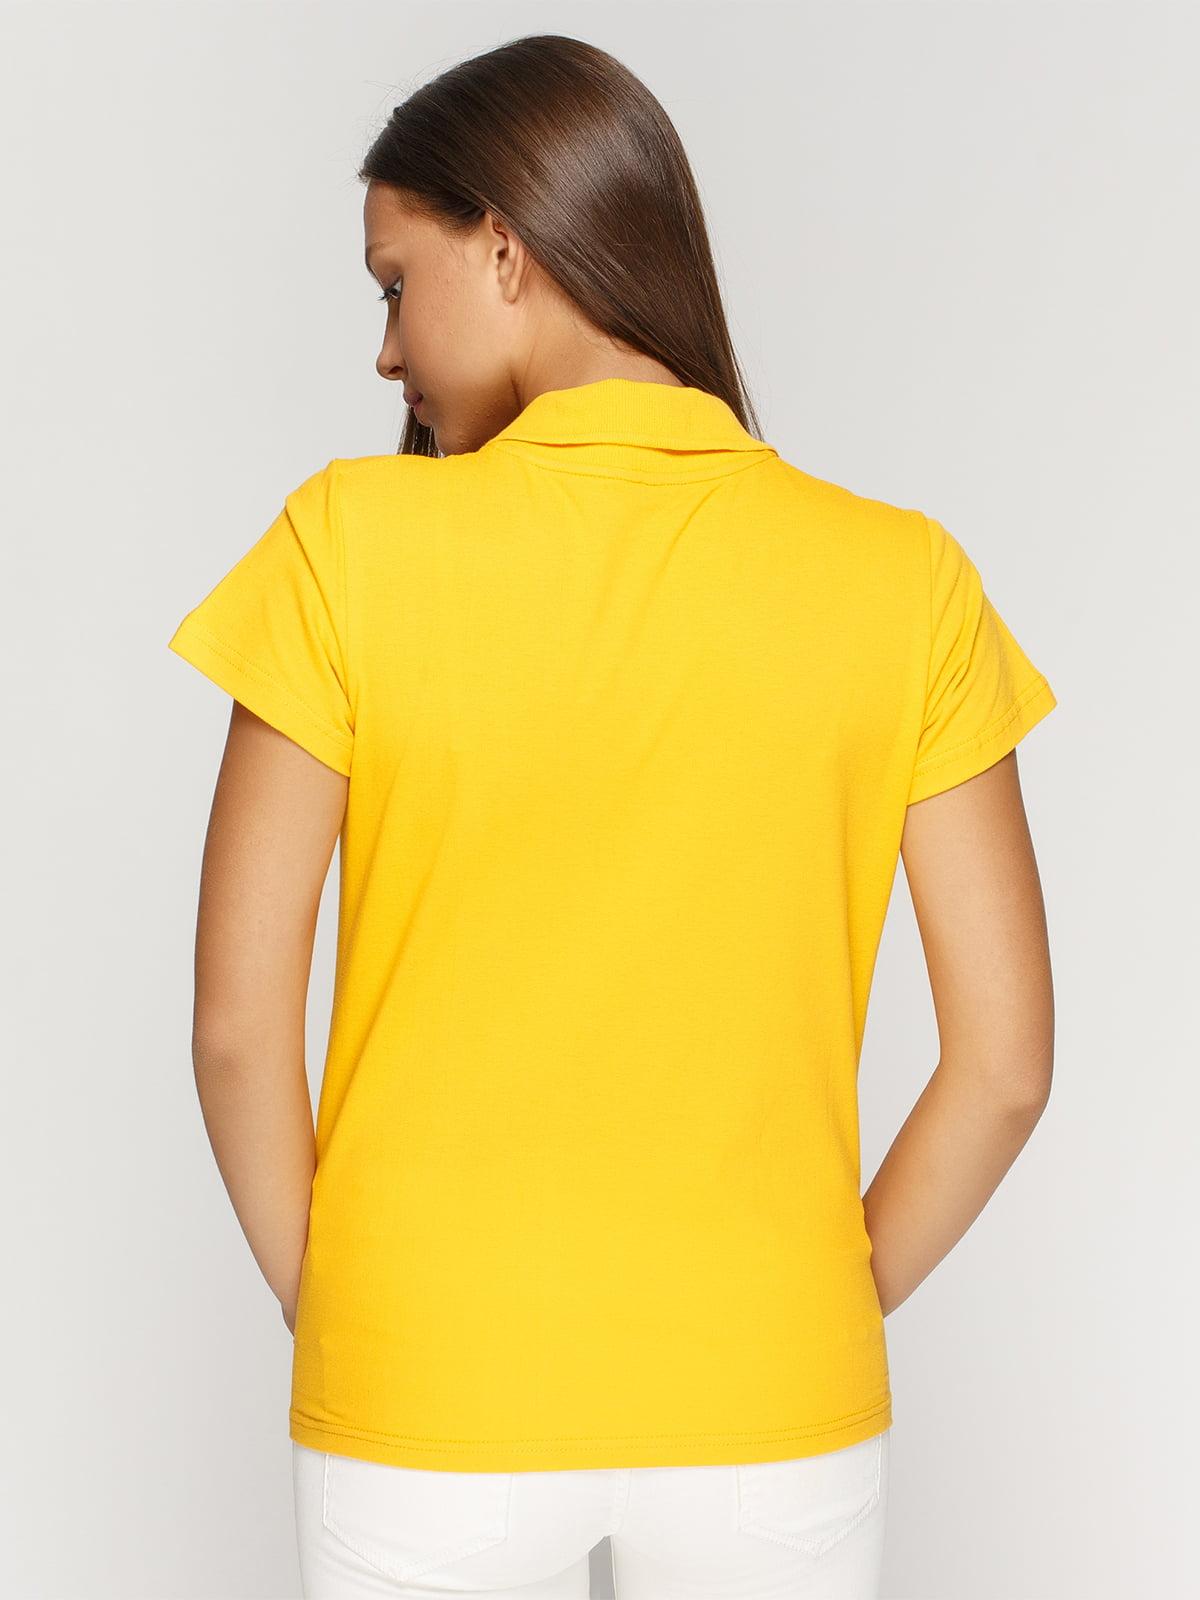 Футболка-поло жовта з принтом | 4578479 | фото 2